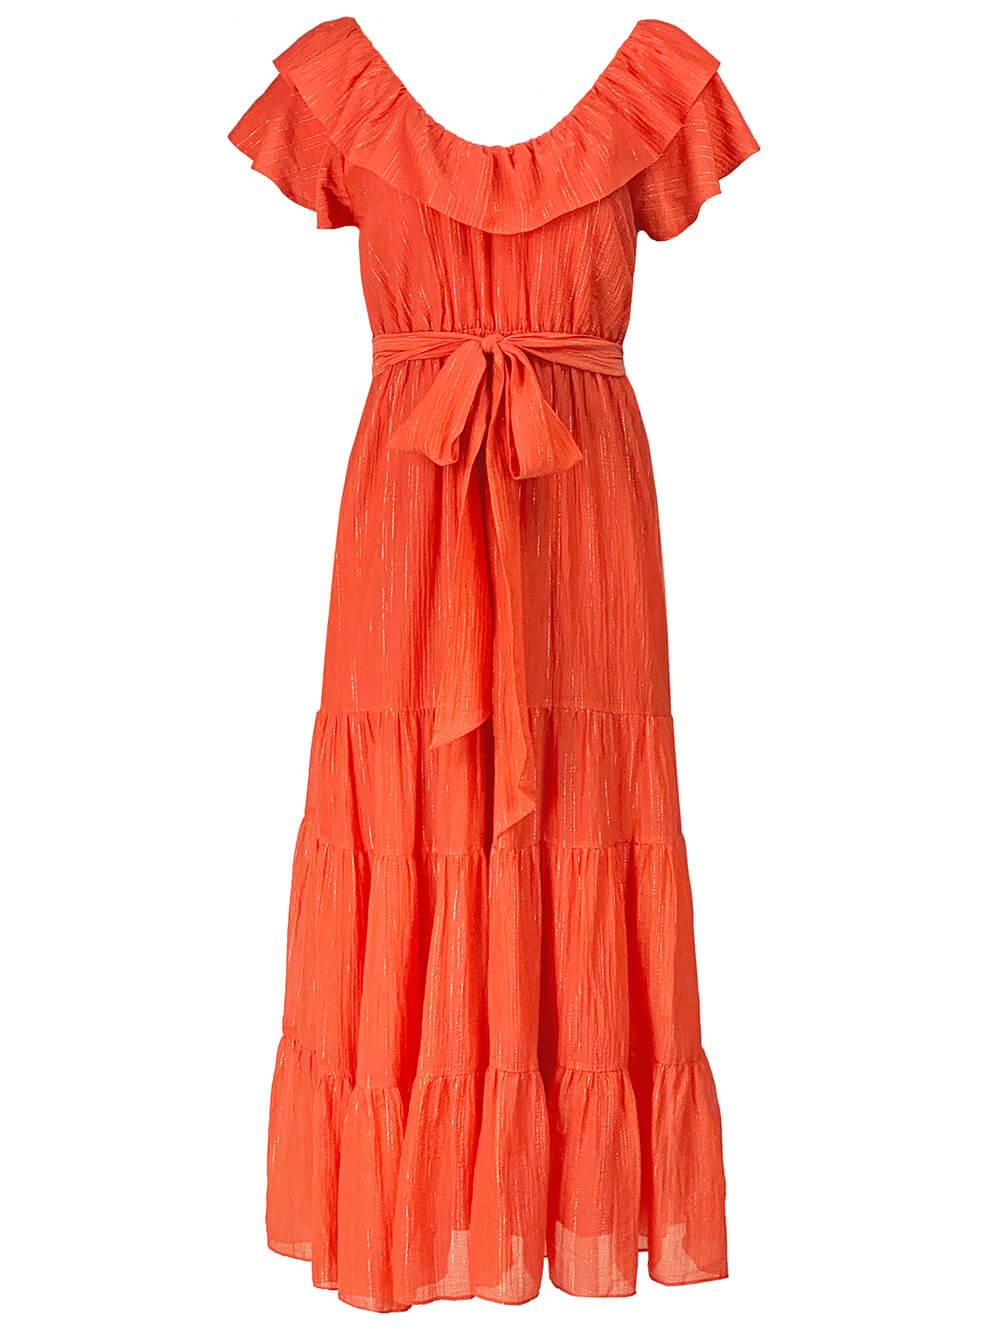 Kinley Maxi Dress